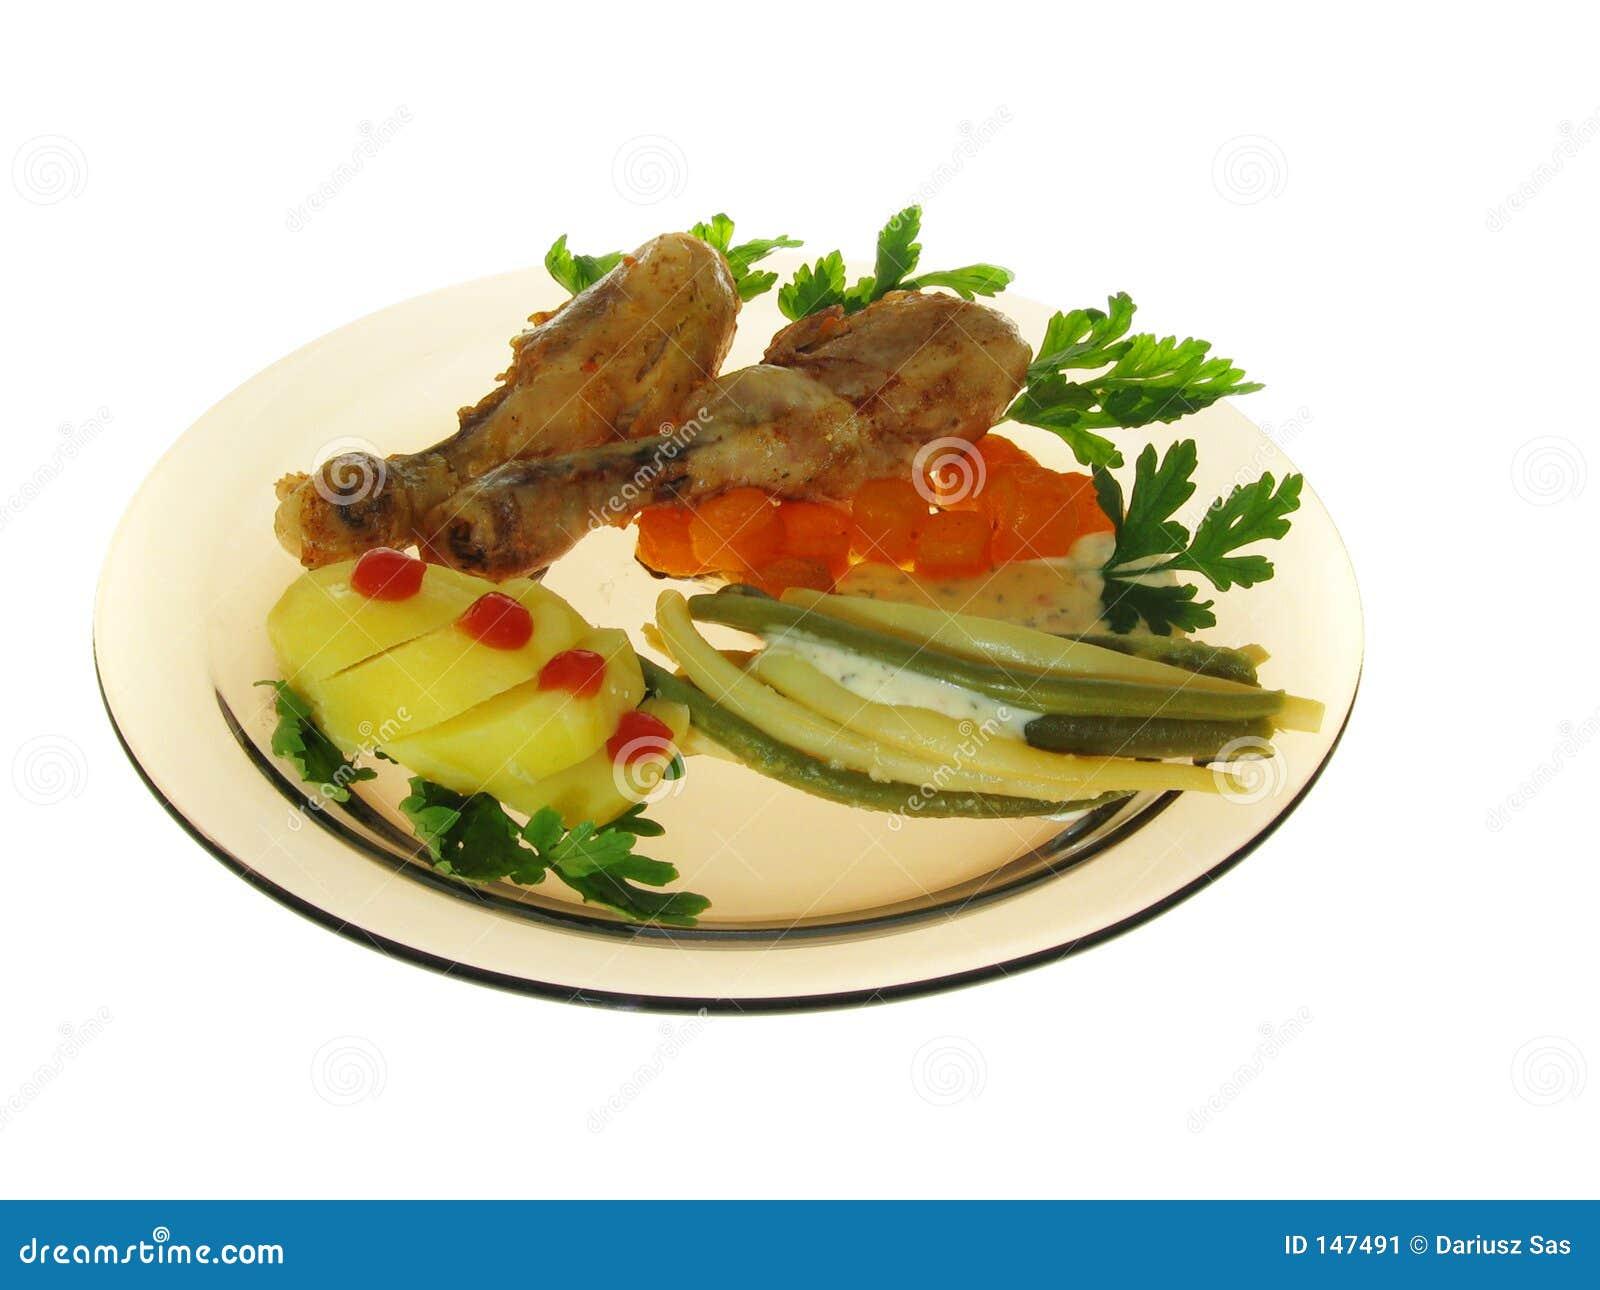 Roast Chicken Stock Image - Image: 147491